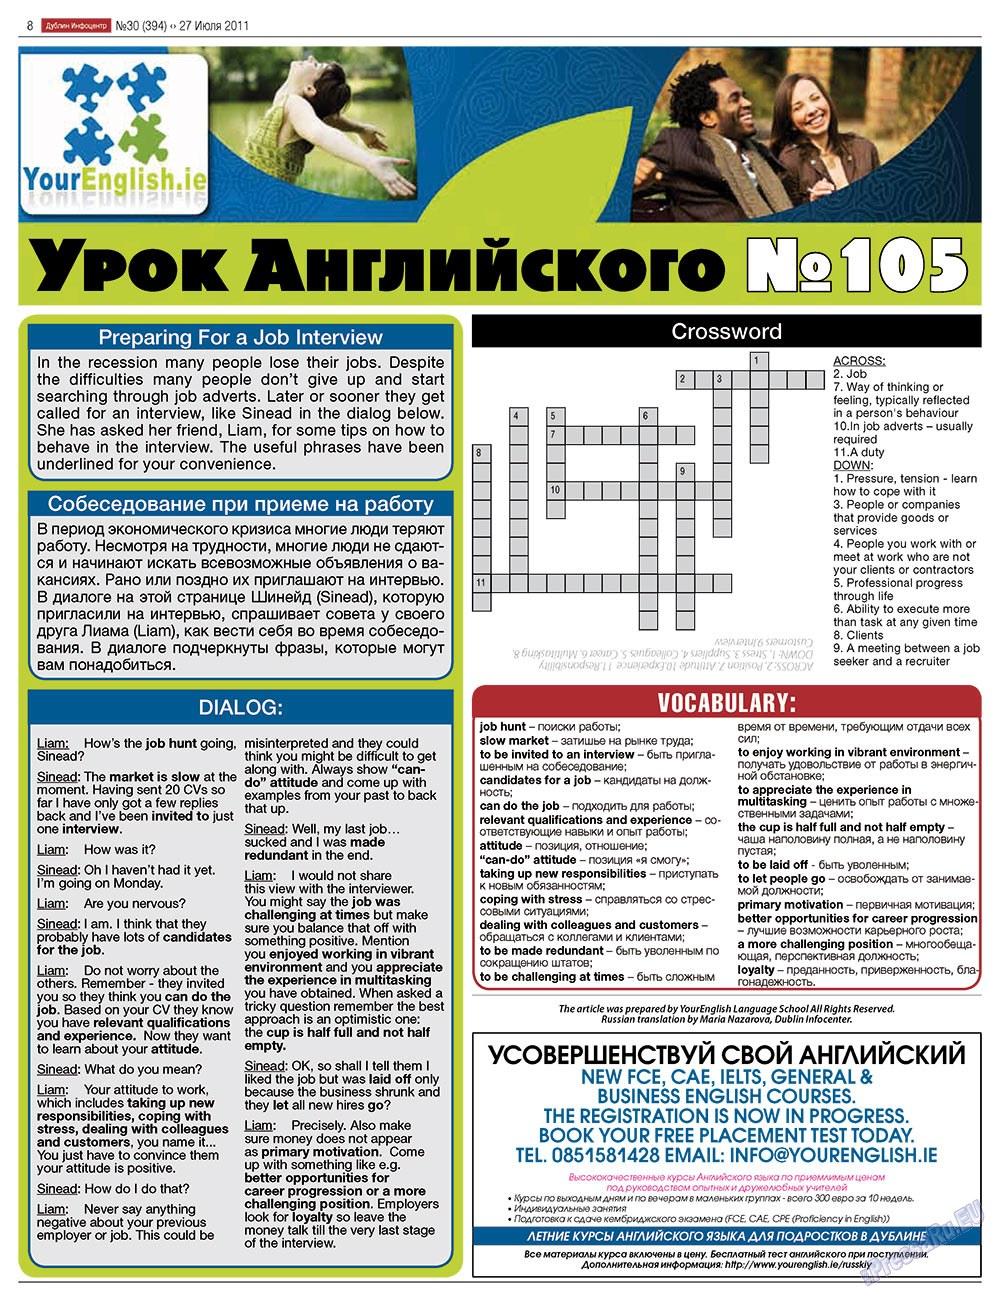 Дублин инфоцентр (газета). 2011 год, номер 30, стр. 8